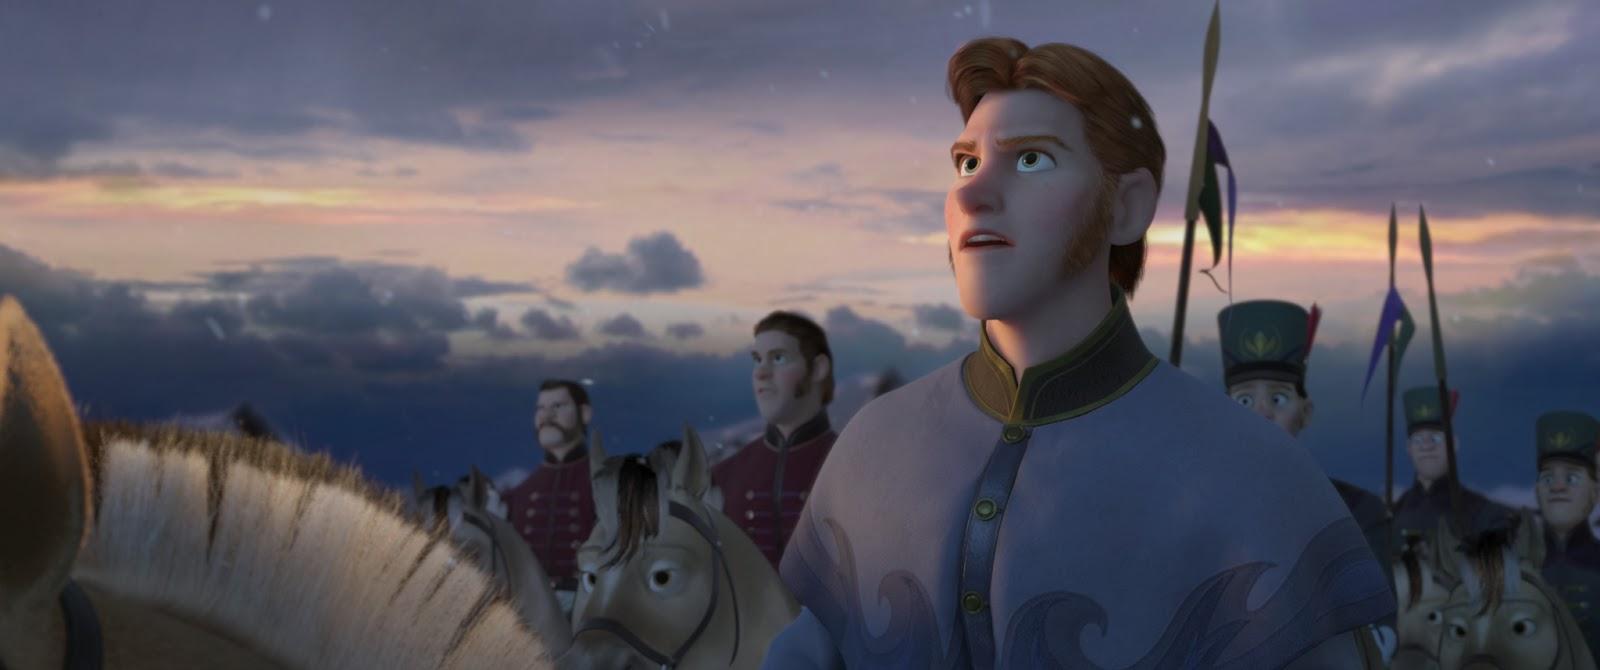 Kristoff Frozen animatedfilmreviews.filminspector.com